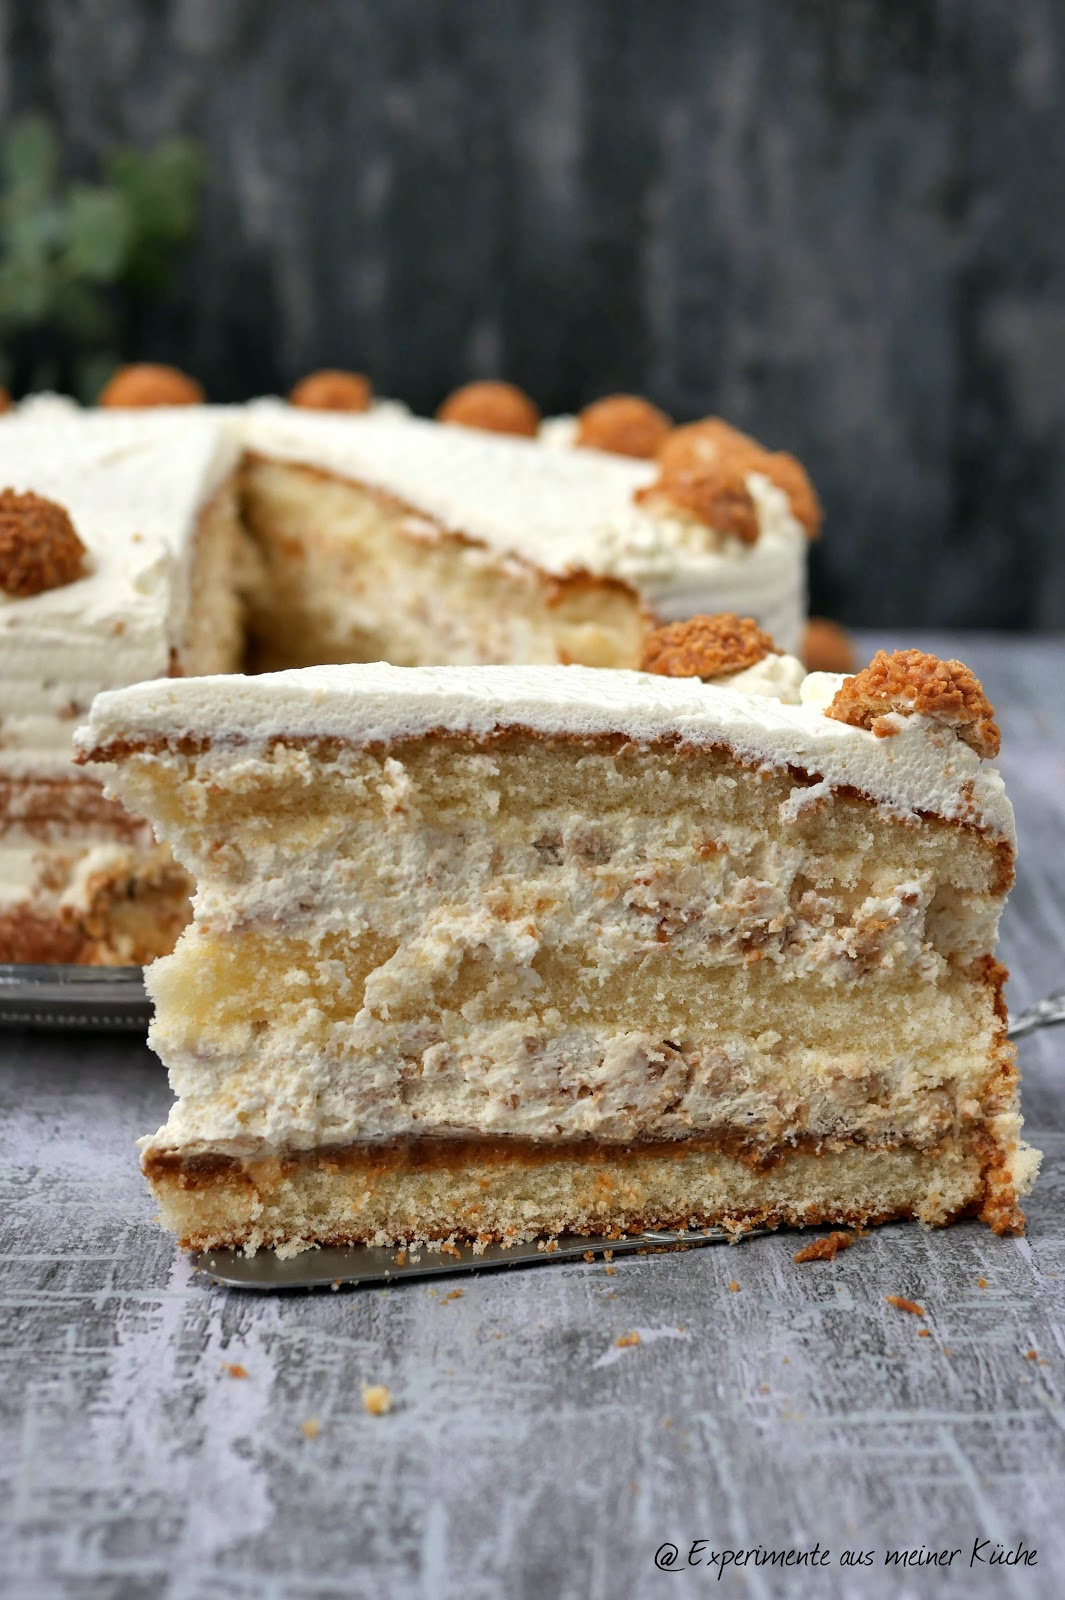 Experimente Aus Meiner Kuche Giotto Spekualtius Torte